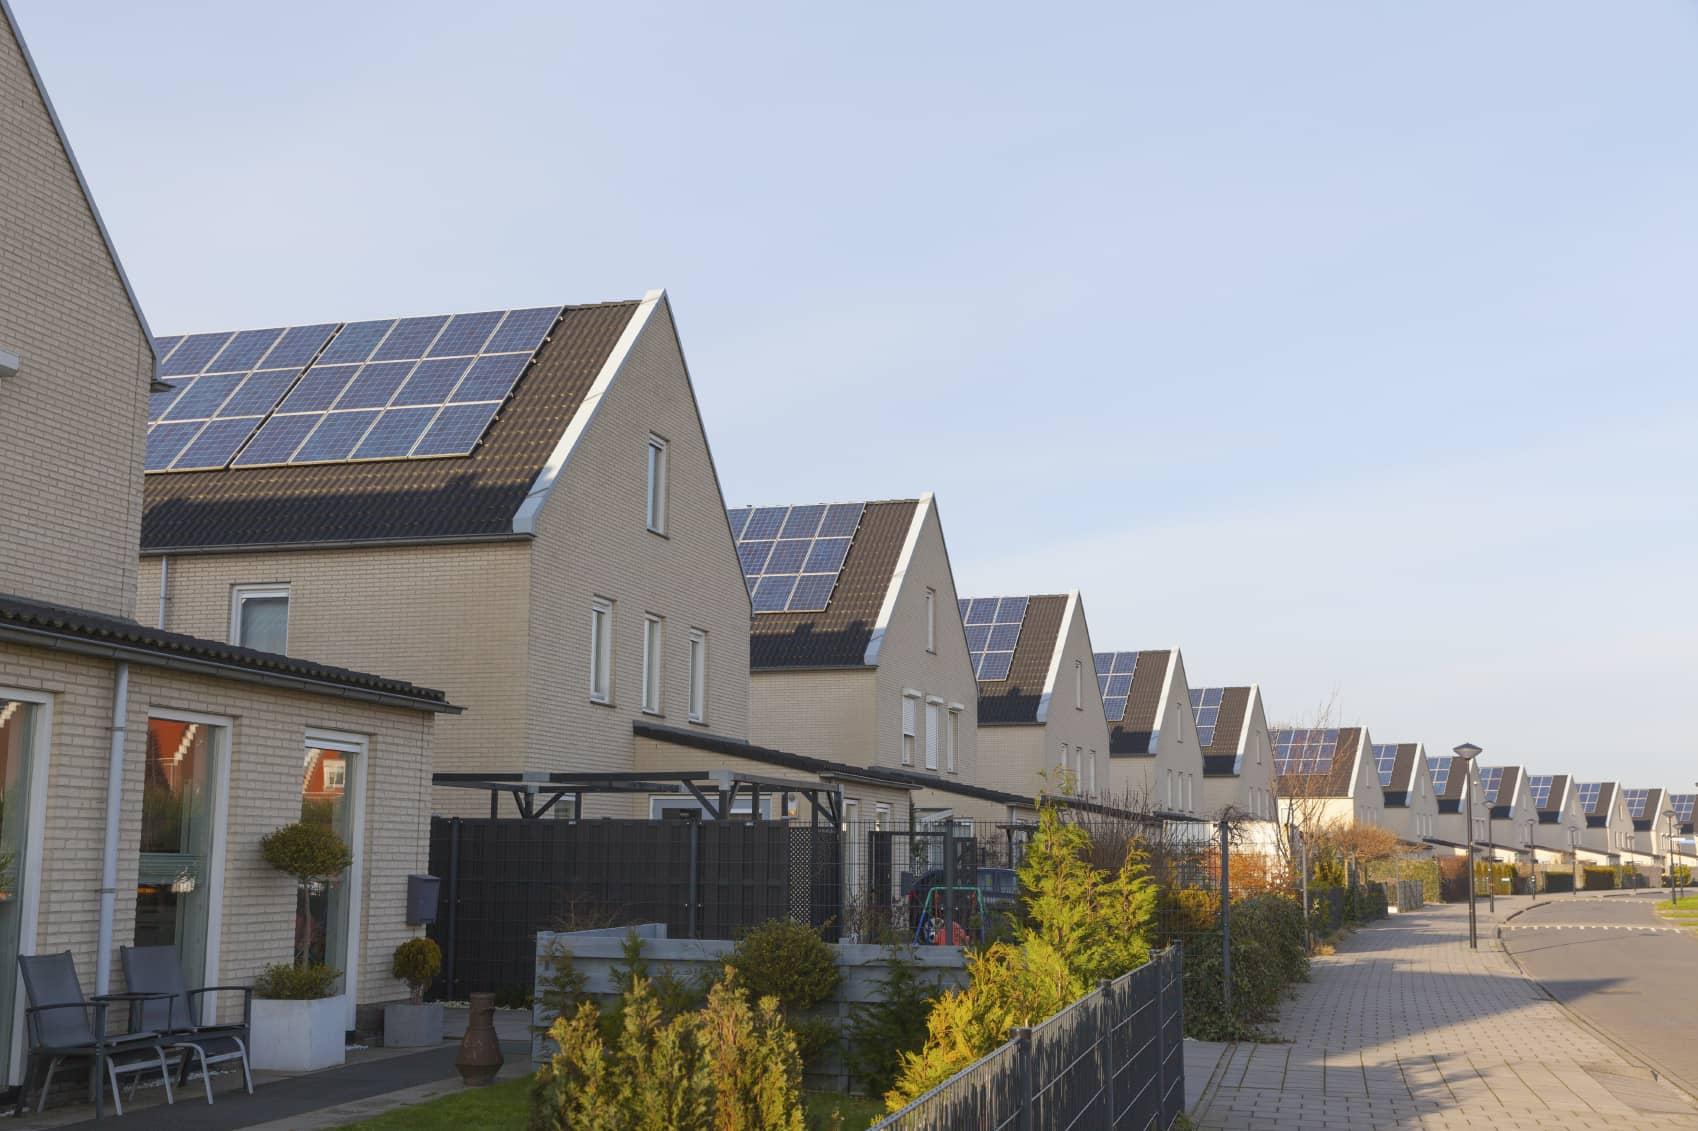 iStock_000088040571_Medium Milestone: Vivint Surpasses 100,000 Solar Systems Installed